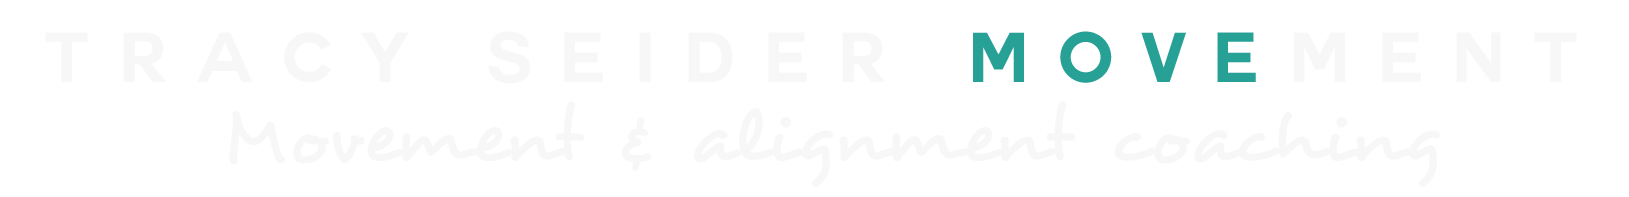 Tracy Seider Logo3.png